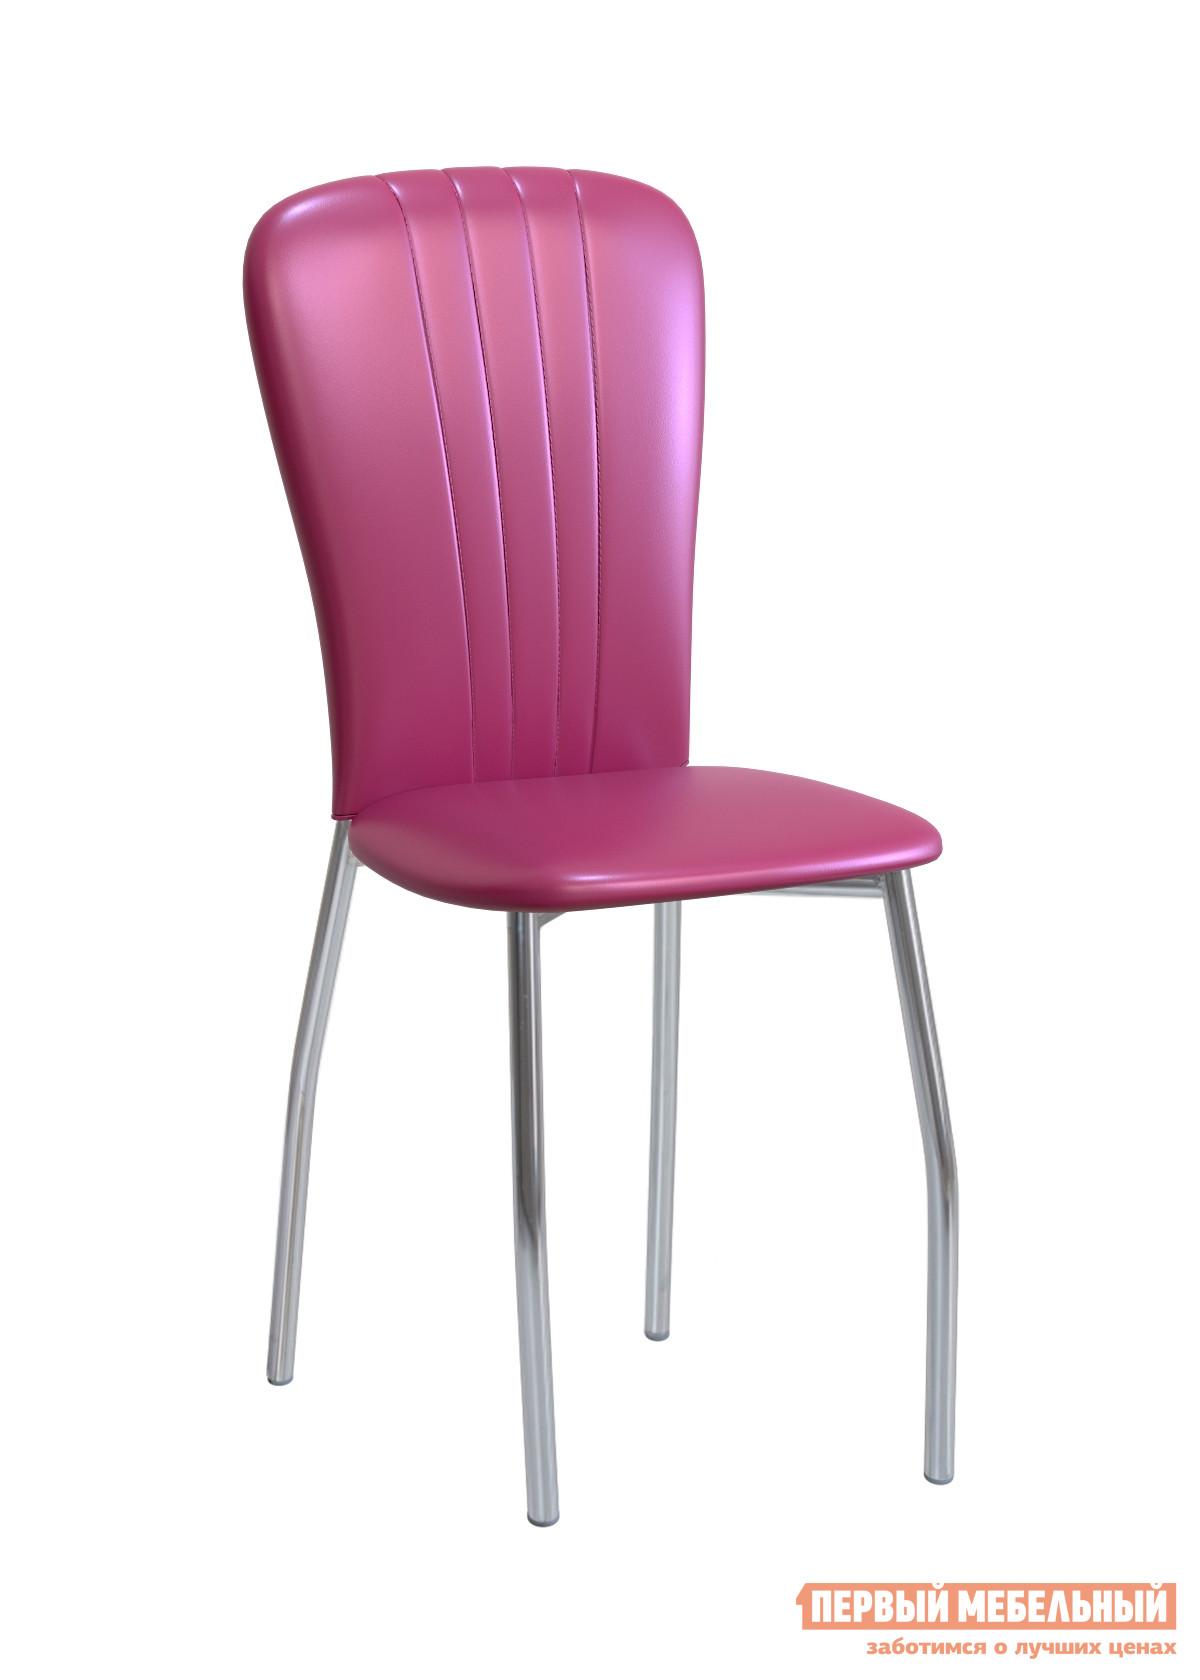 Стул Первый Мебельный Стул Клэр динамический стул swoppster